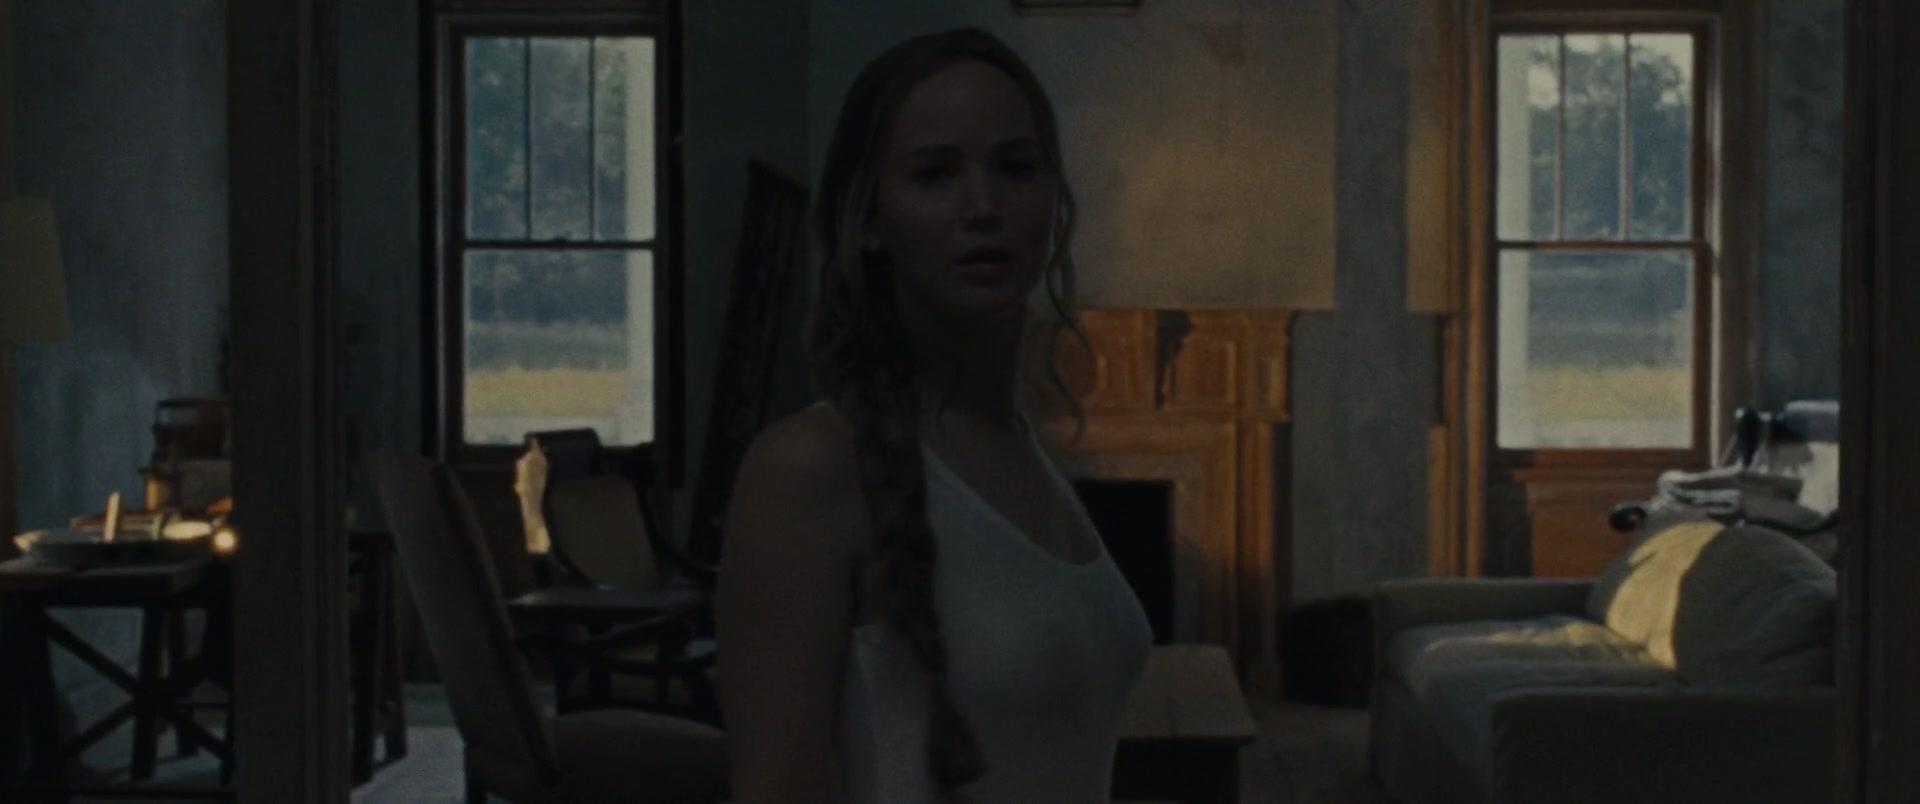 Jennifer-Lawrence-Michelle-Pfeiffer-Mother-2-thefappeningblog.com_.jpg